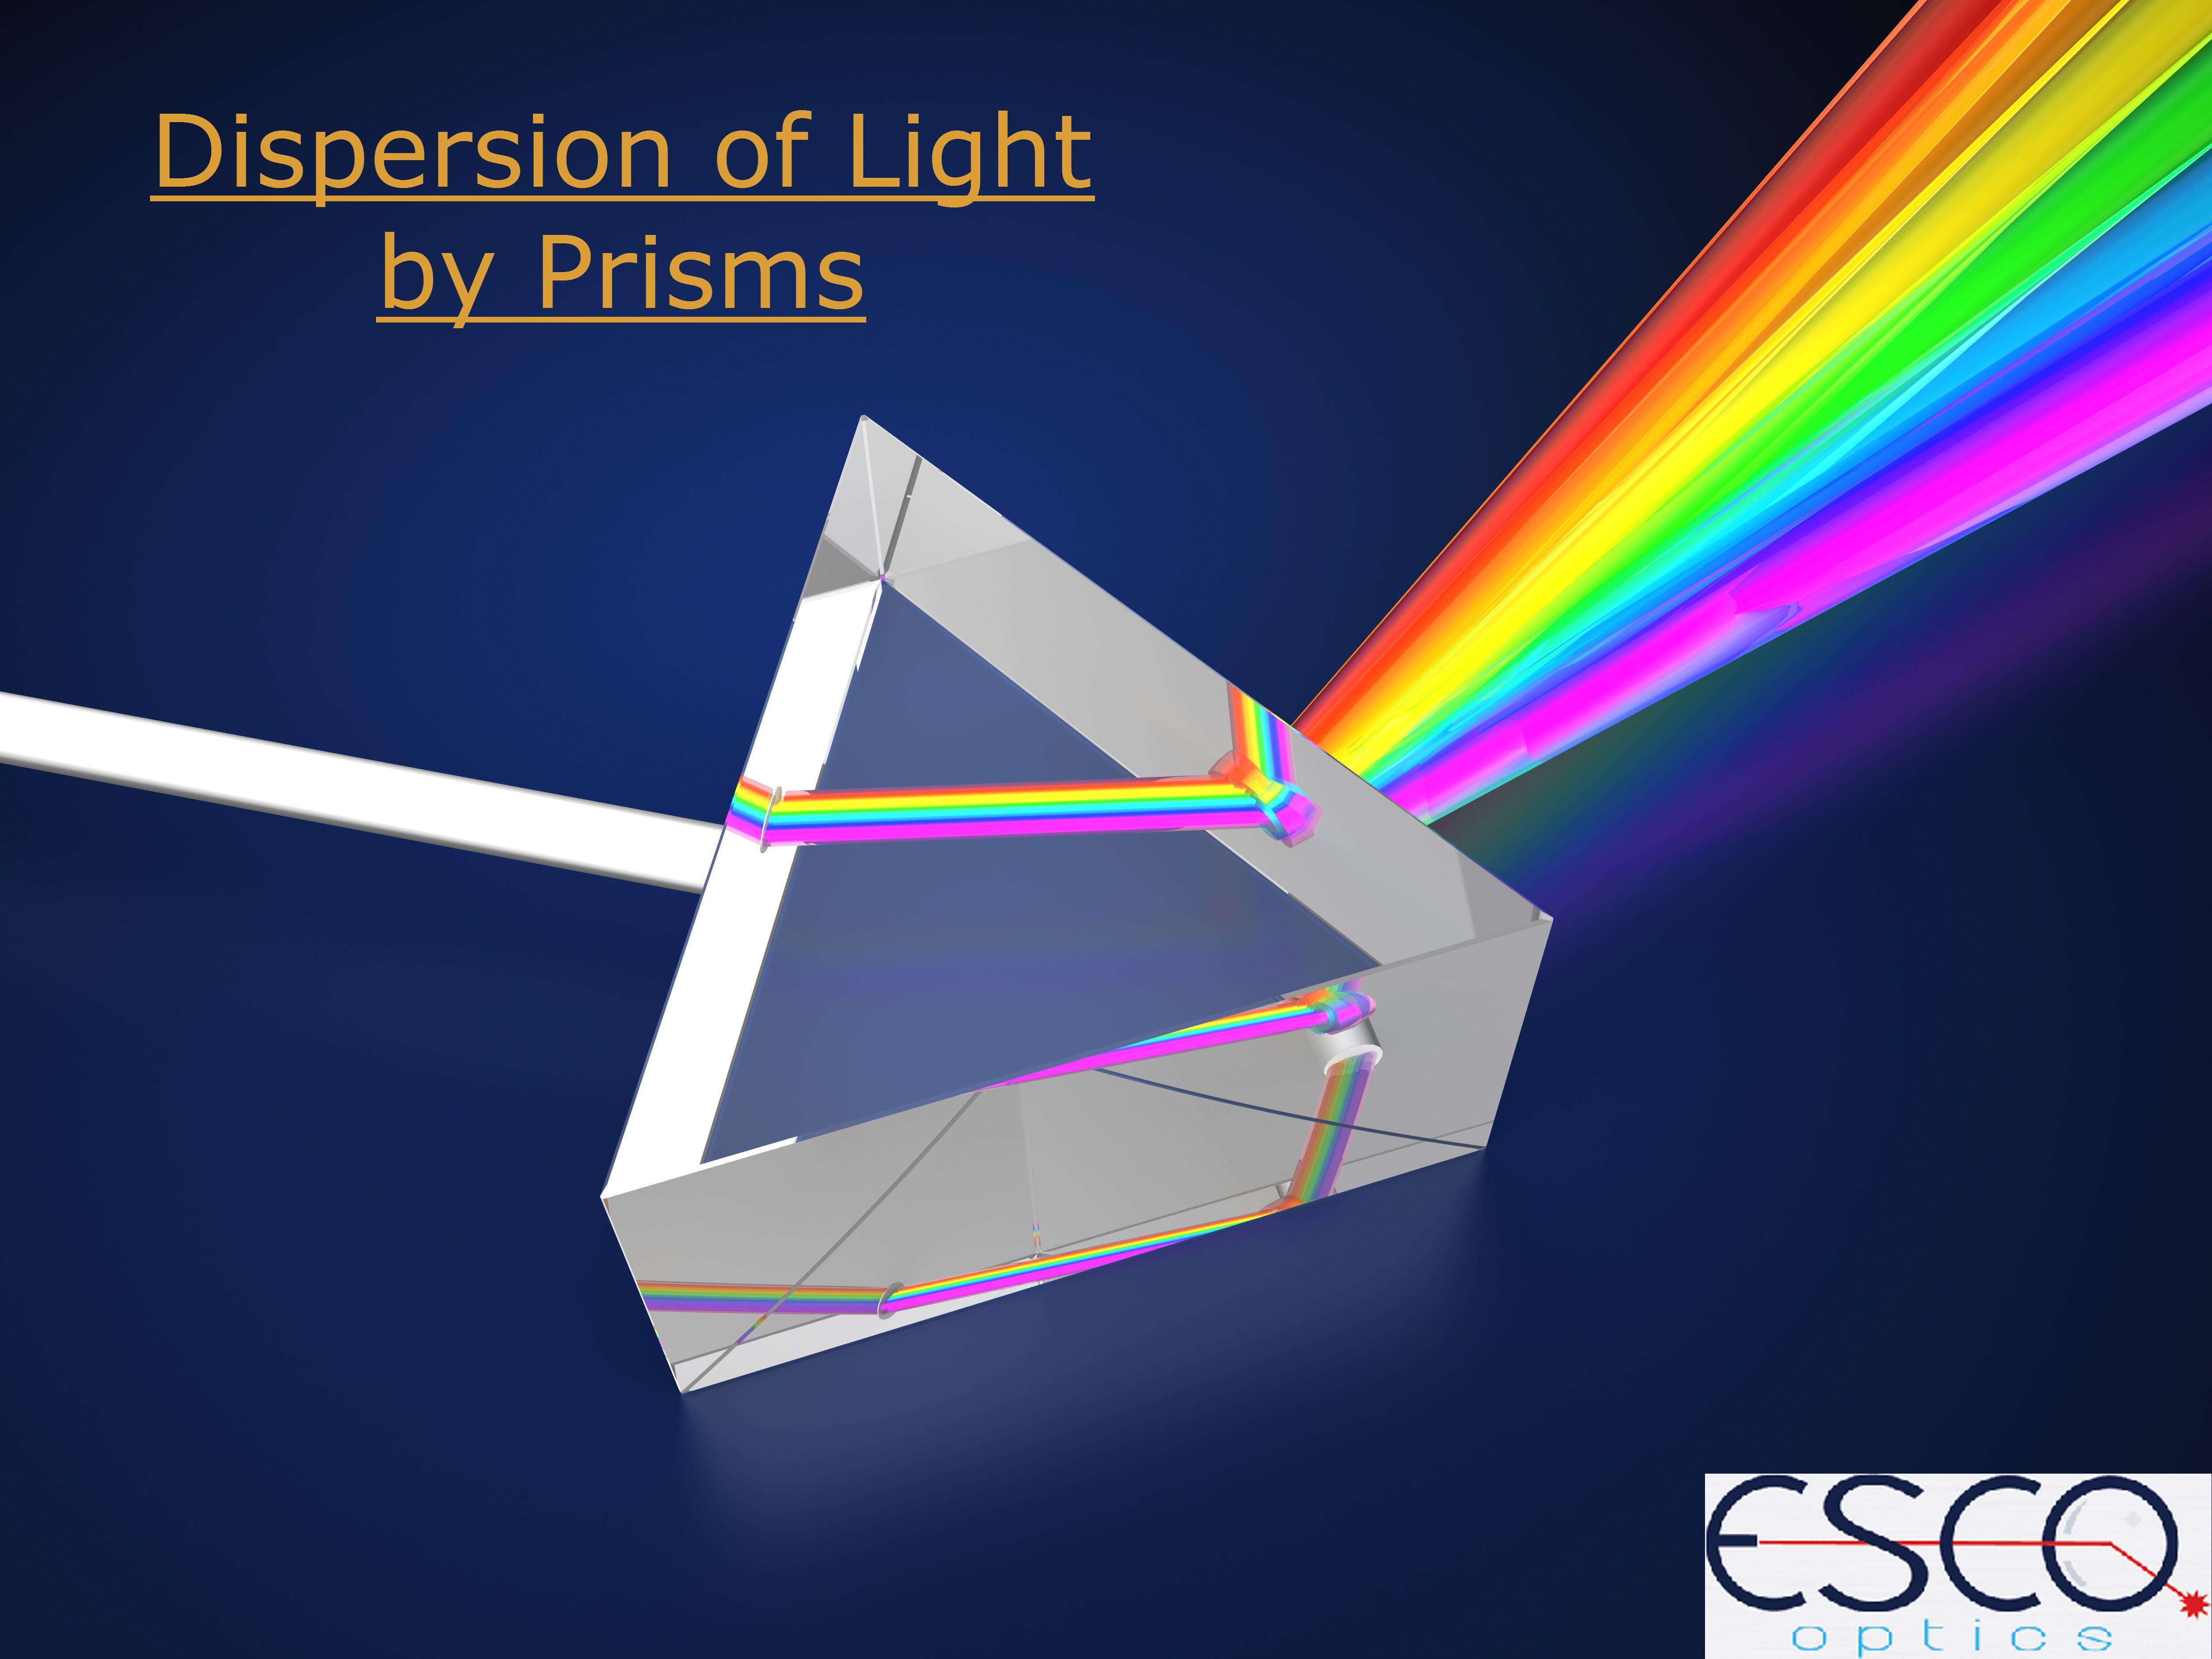 Cooptics Dispersion Of Light Provides Evidence